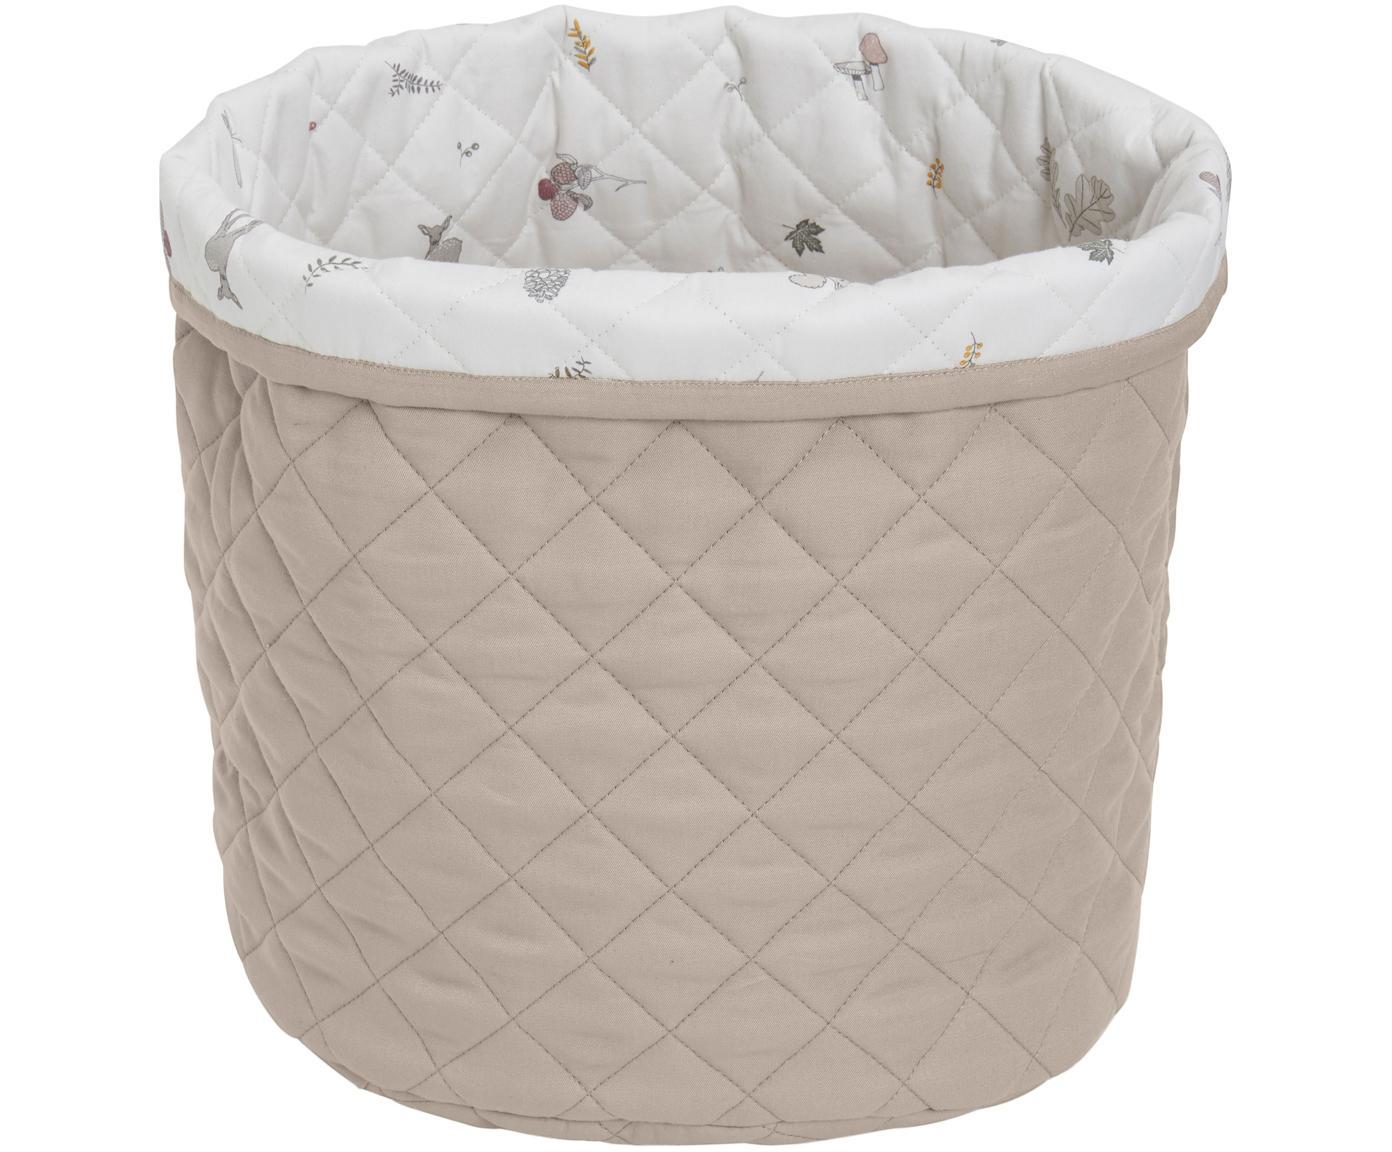 Cesta Fawn, Tapizado: algodón orgánico, Blanco, marrón, beige, Ø 30 x Al 33 cm